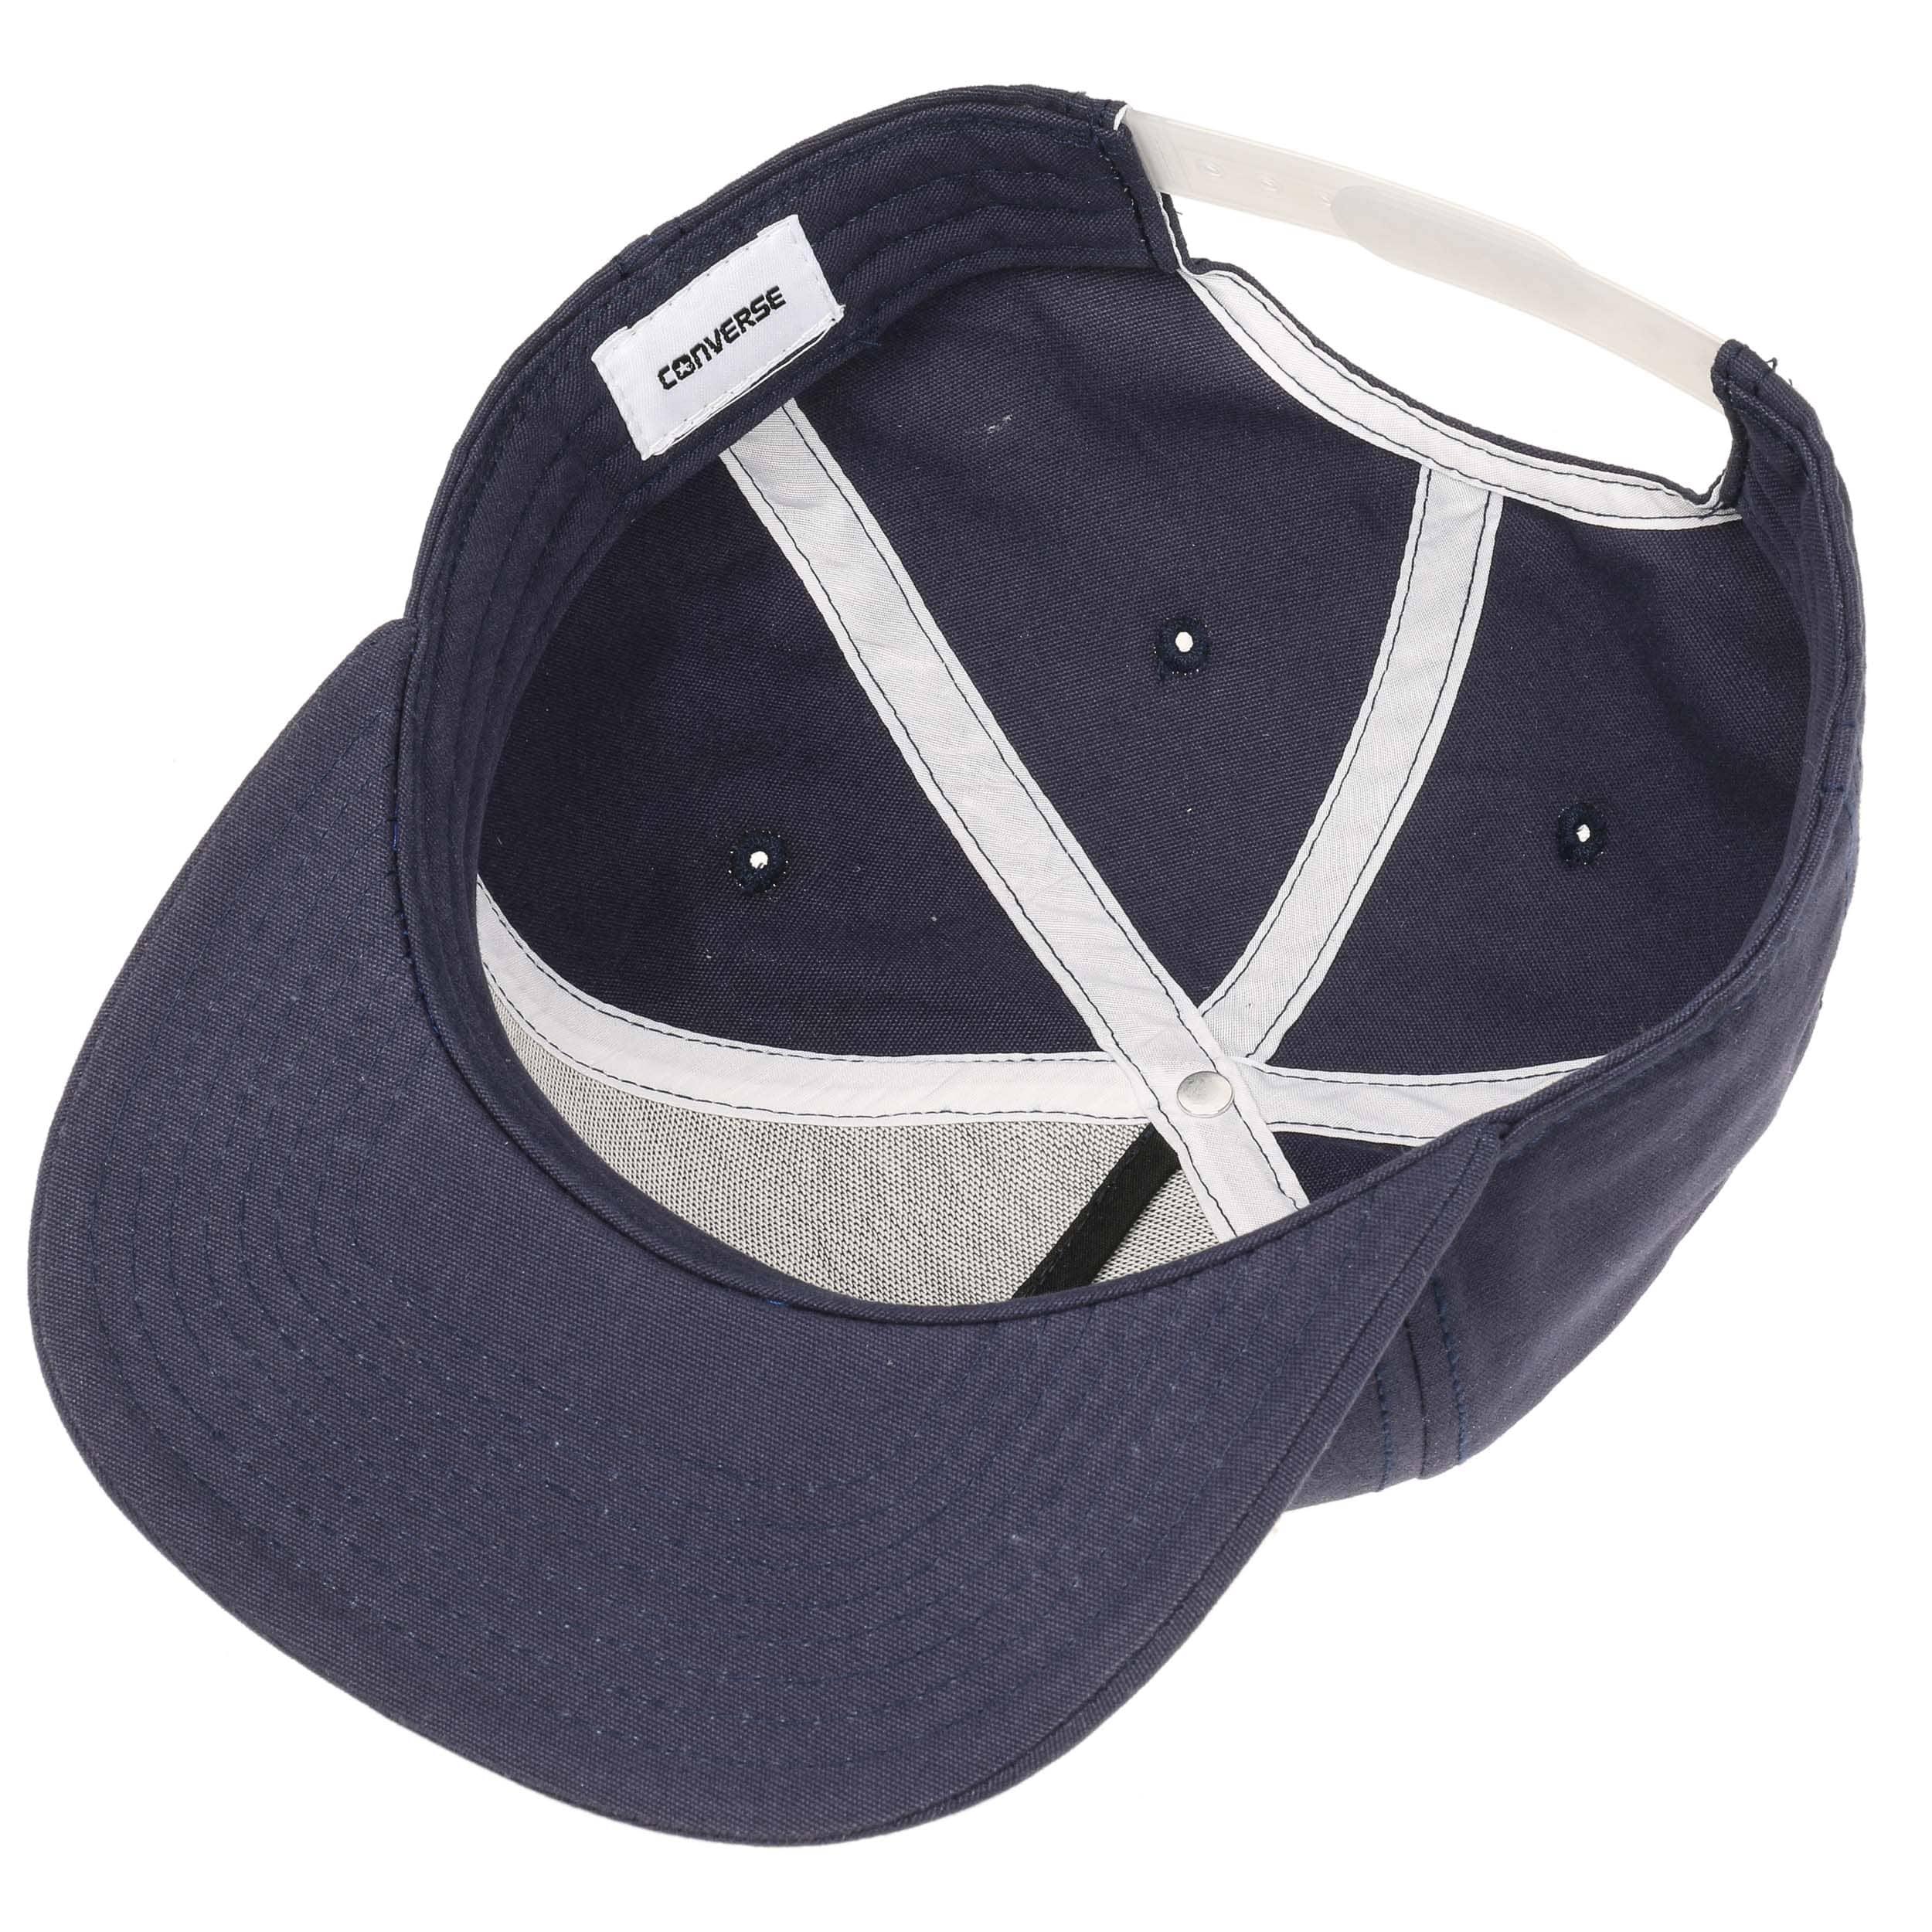 035e3a12 ... black 1 · Translucent C Snapback Cap by Converse - blue 2 ...